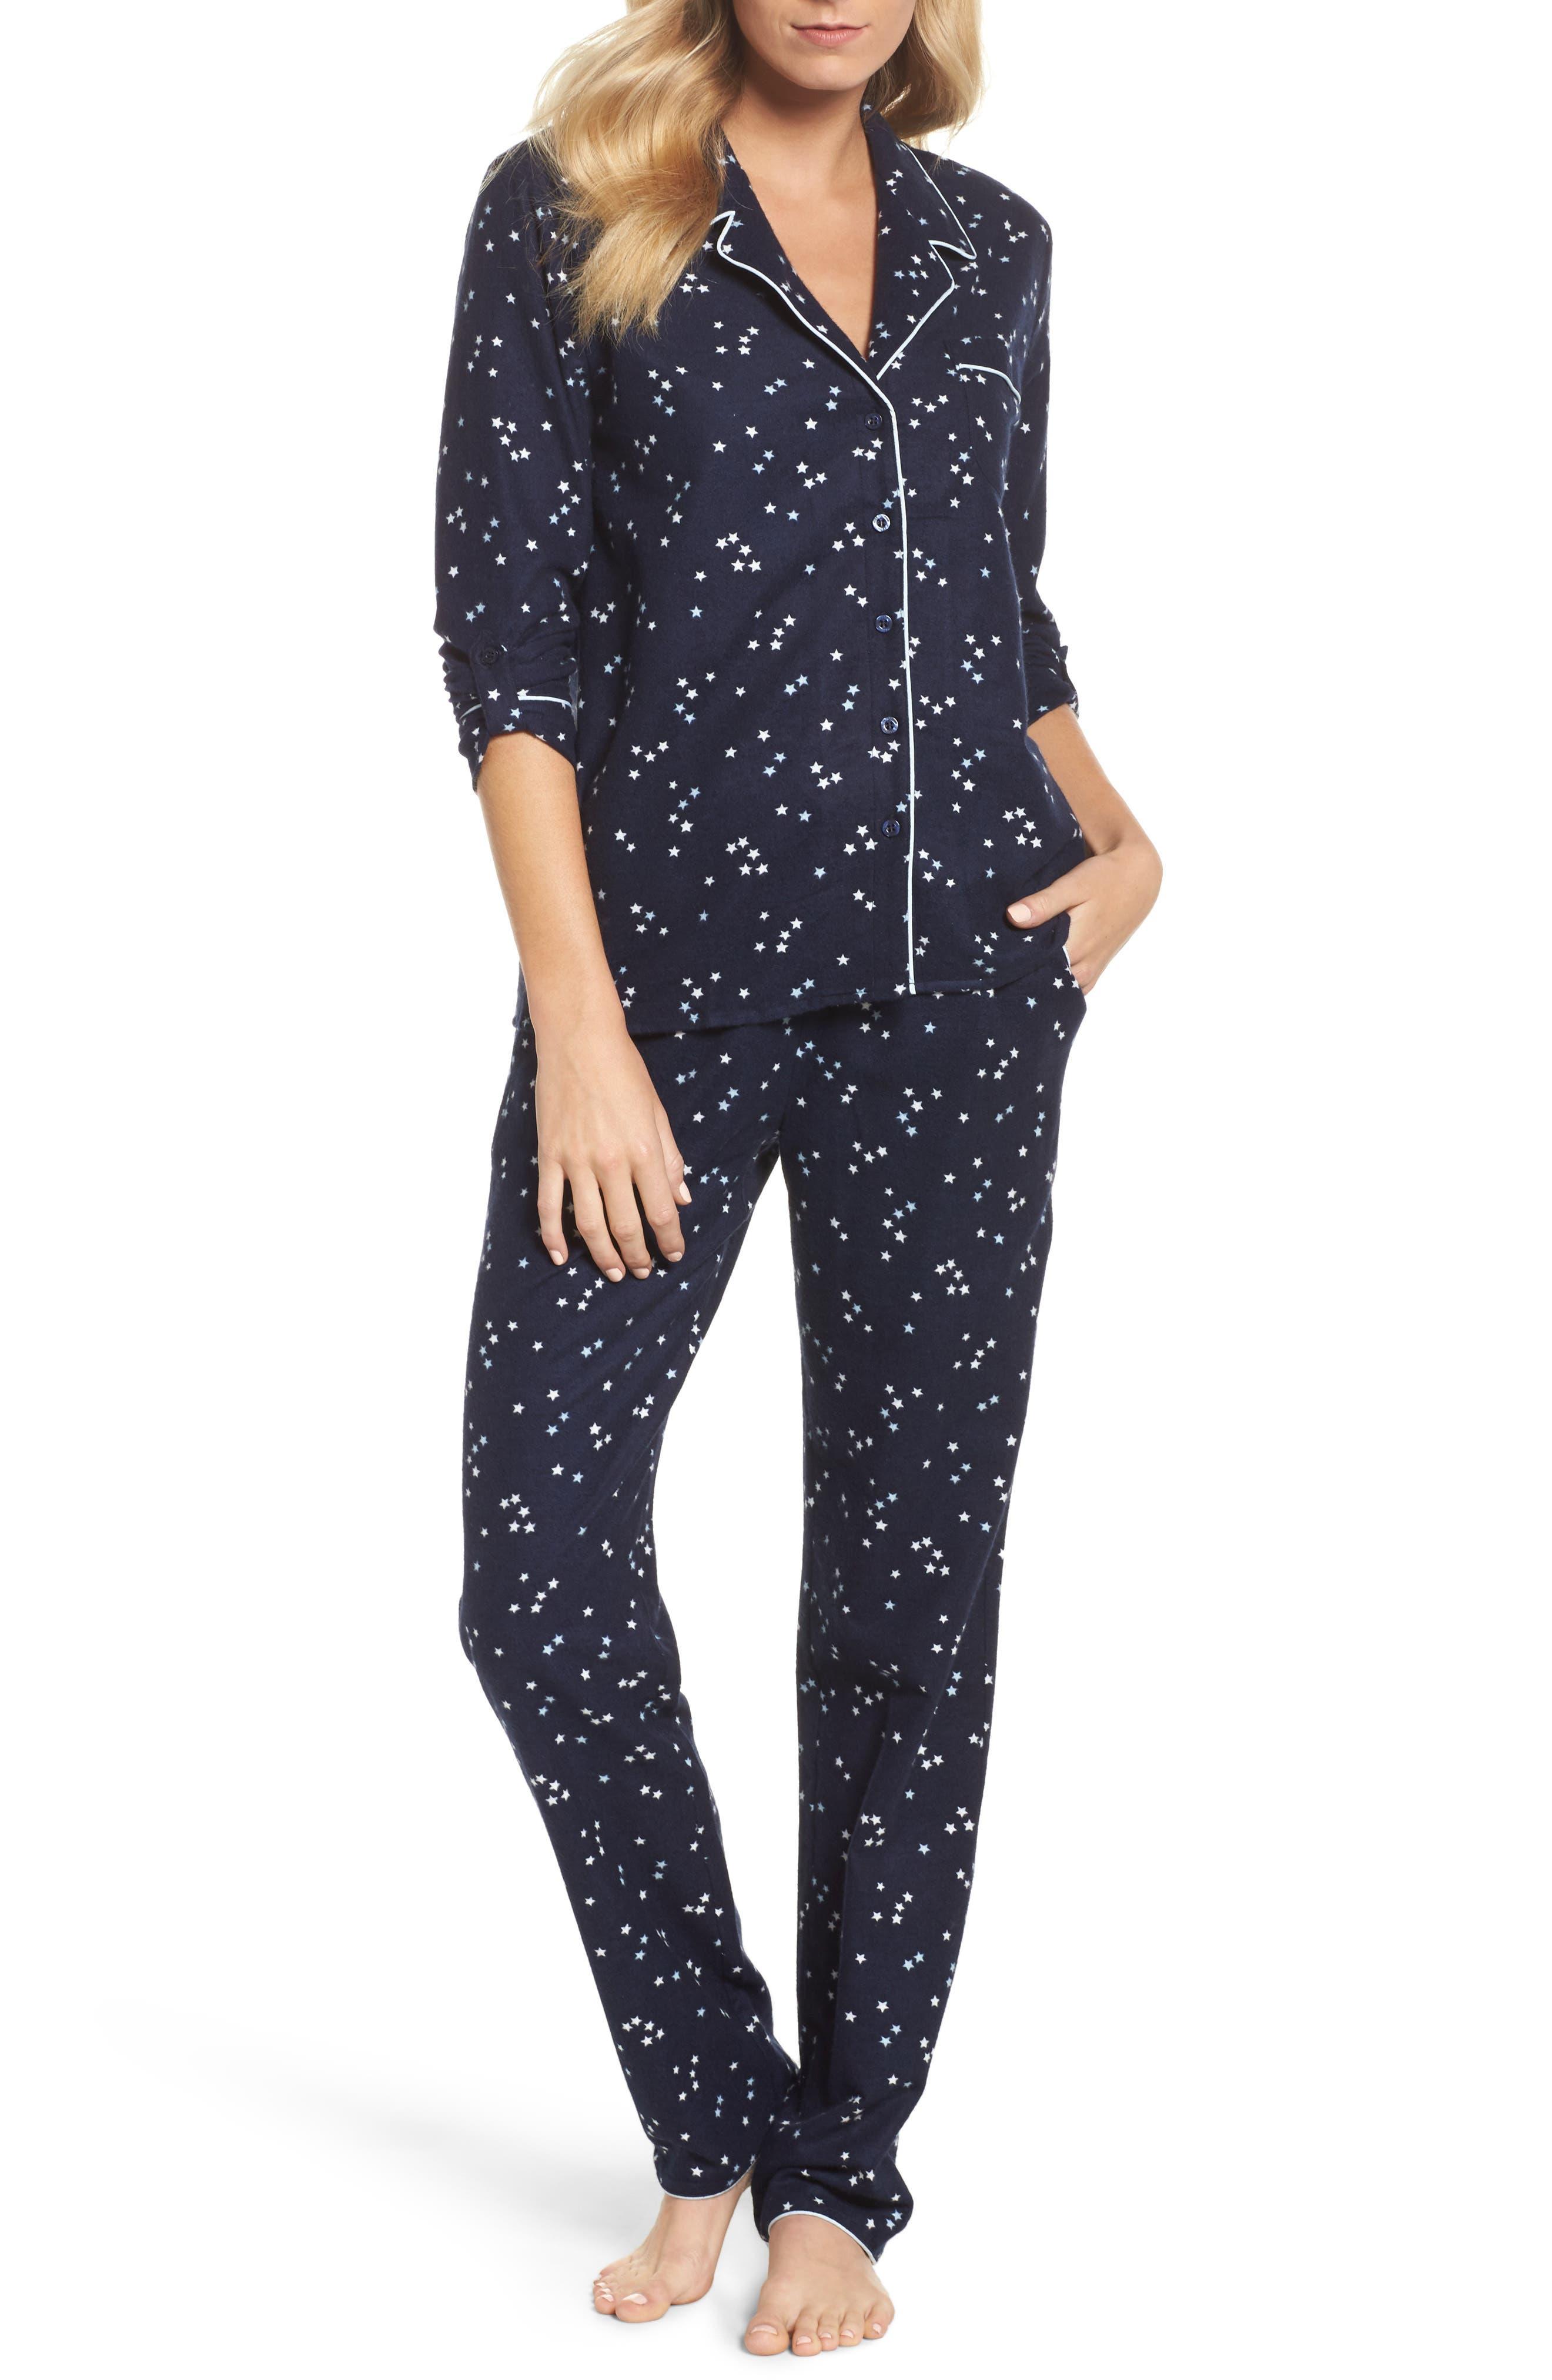 Nordstrom Lingerie Starlight Flannel Pajamas